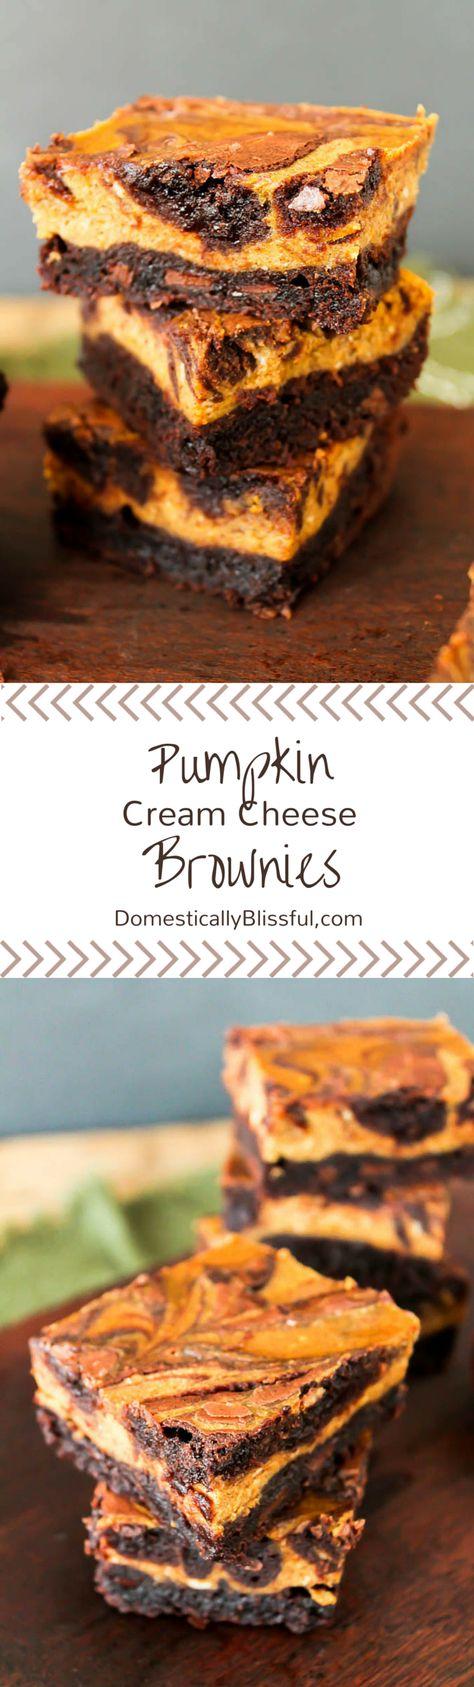 Pumpkin Cream Cheese Brownies |   http://domesticallyblissful.com/pumpkin-cream-cheese-brownies/